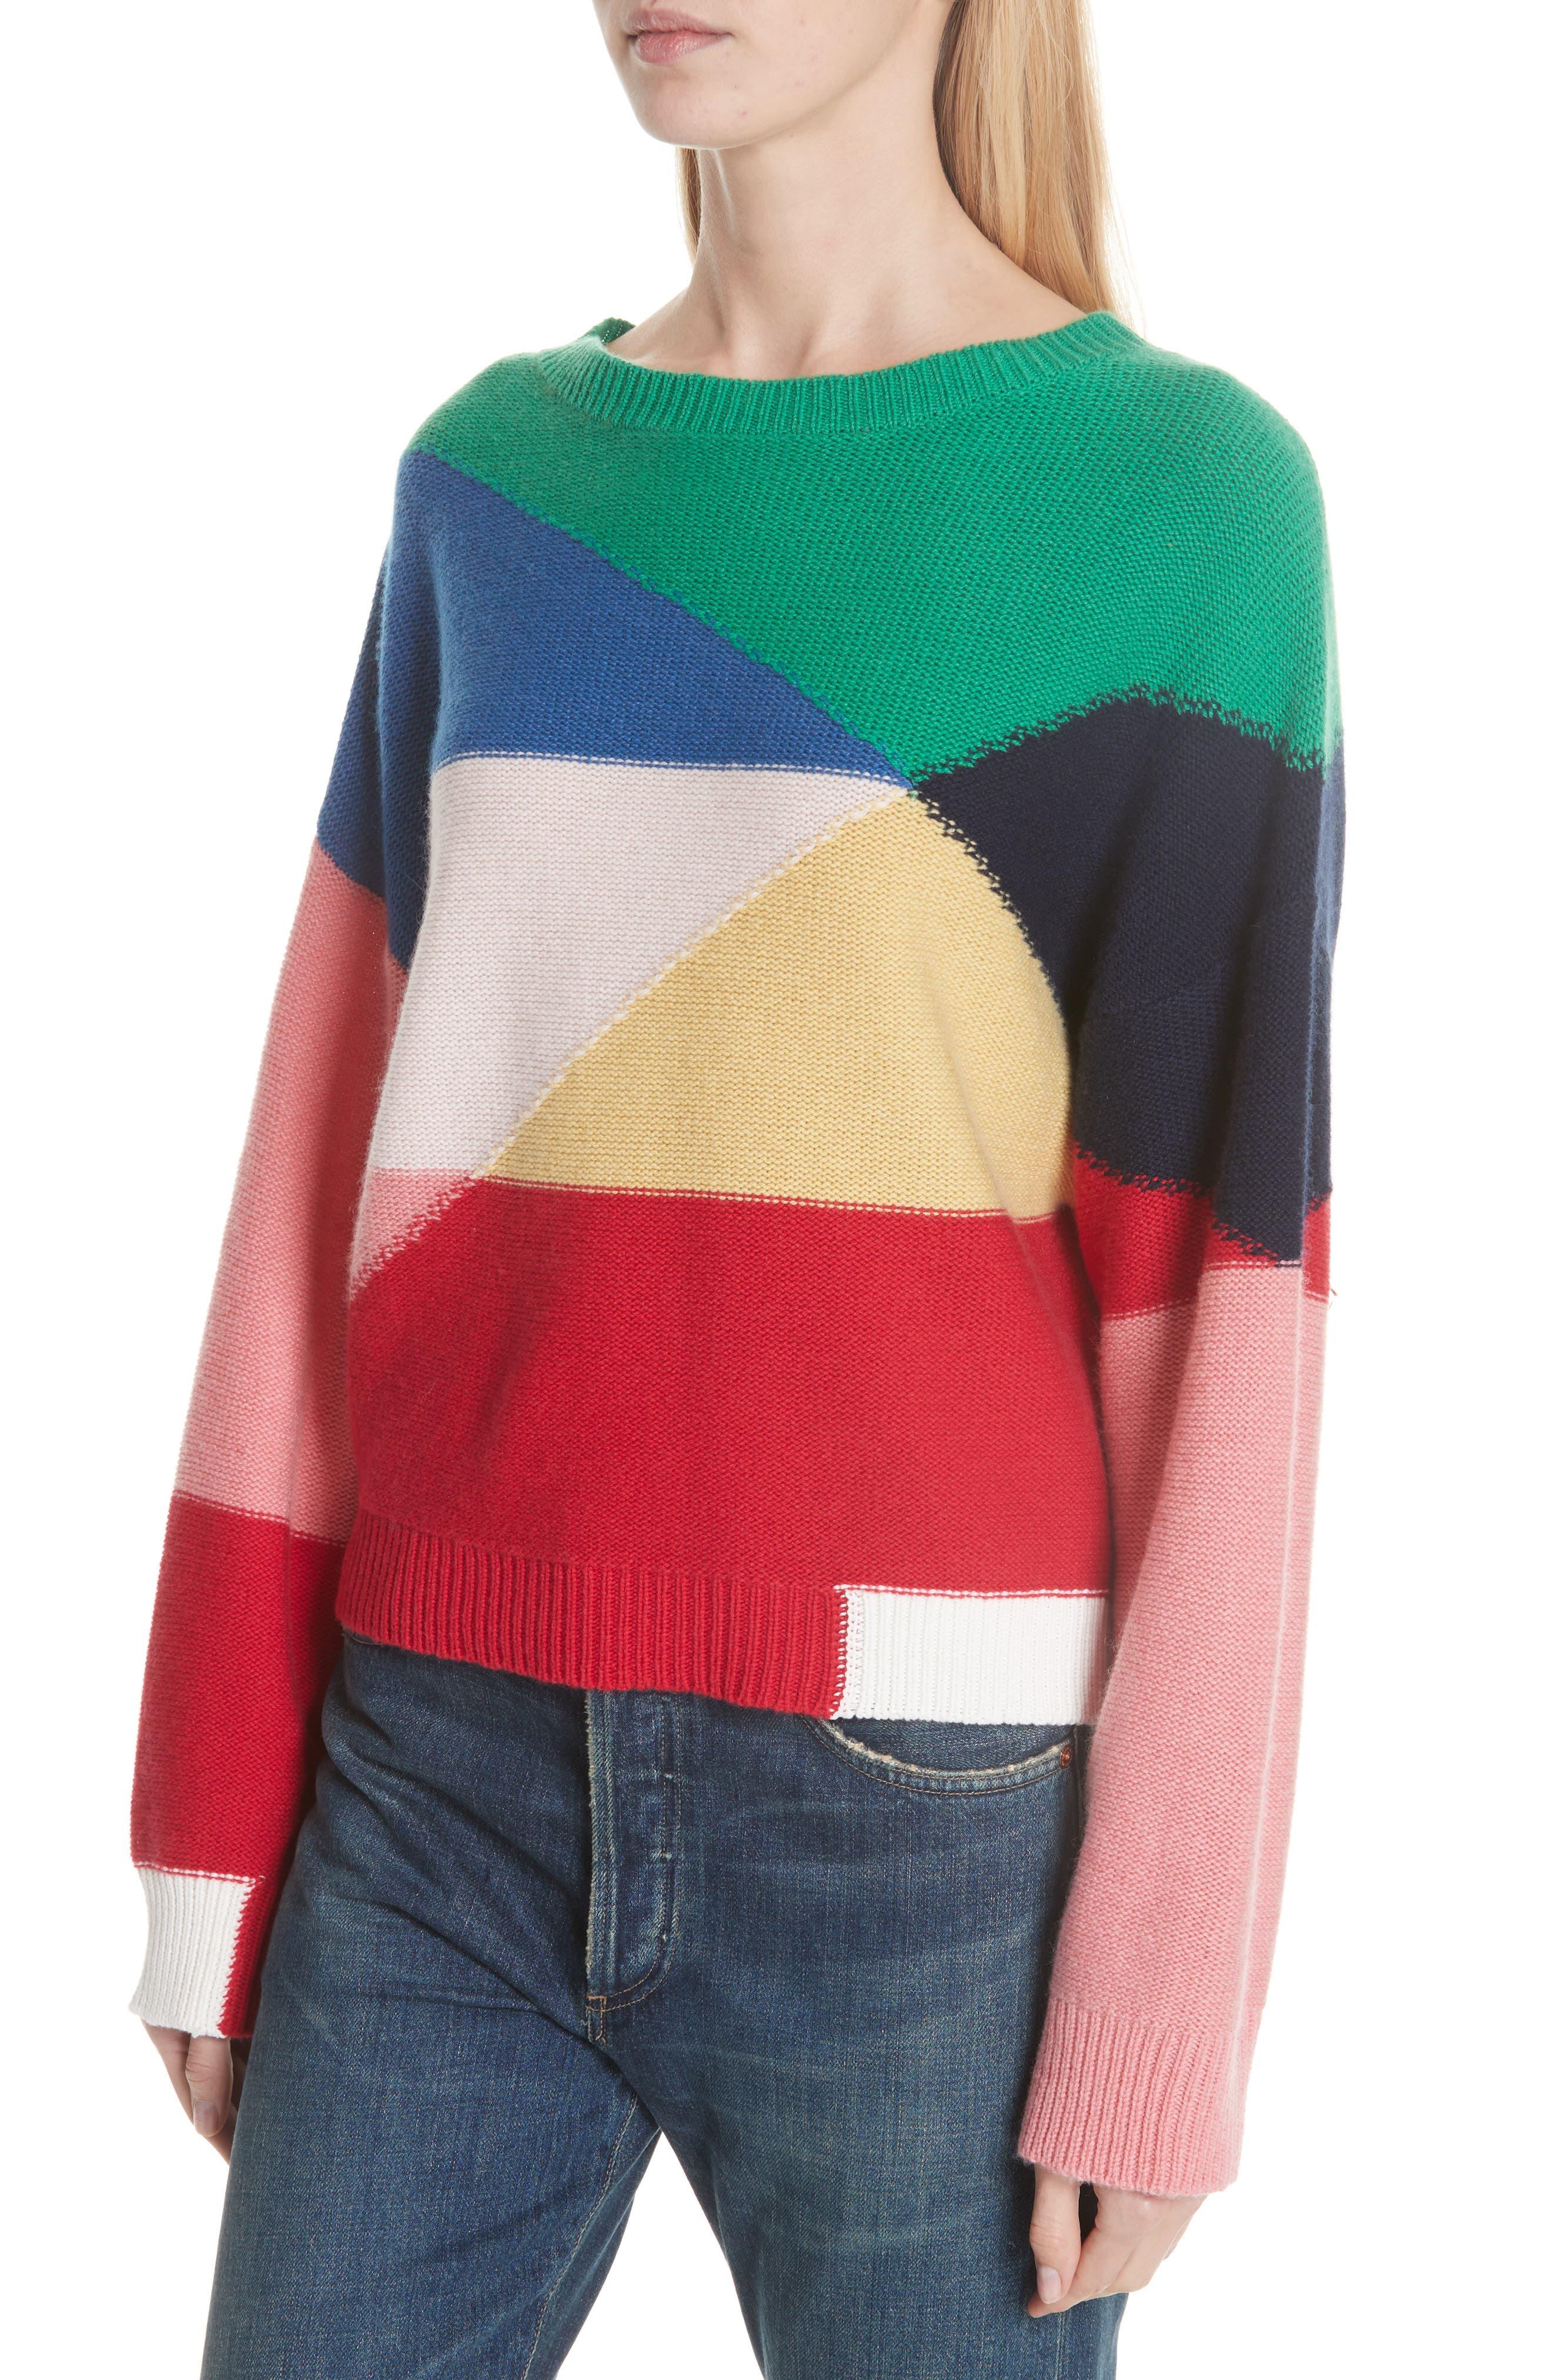 Megu Colorblock Wool & Cashmere Sweater,                             Alternate thumbnail 4, color,                             Multi